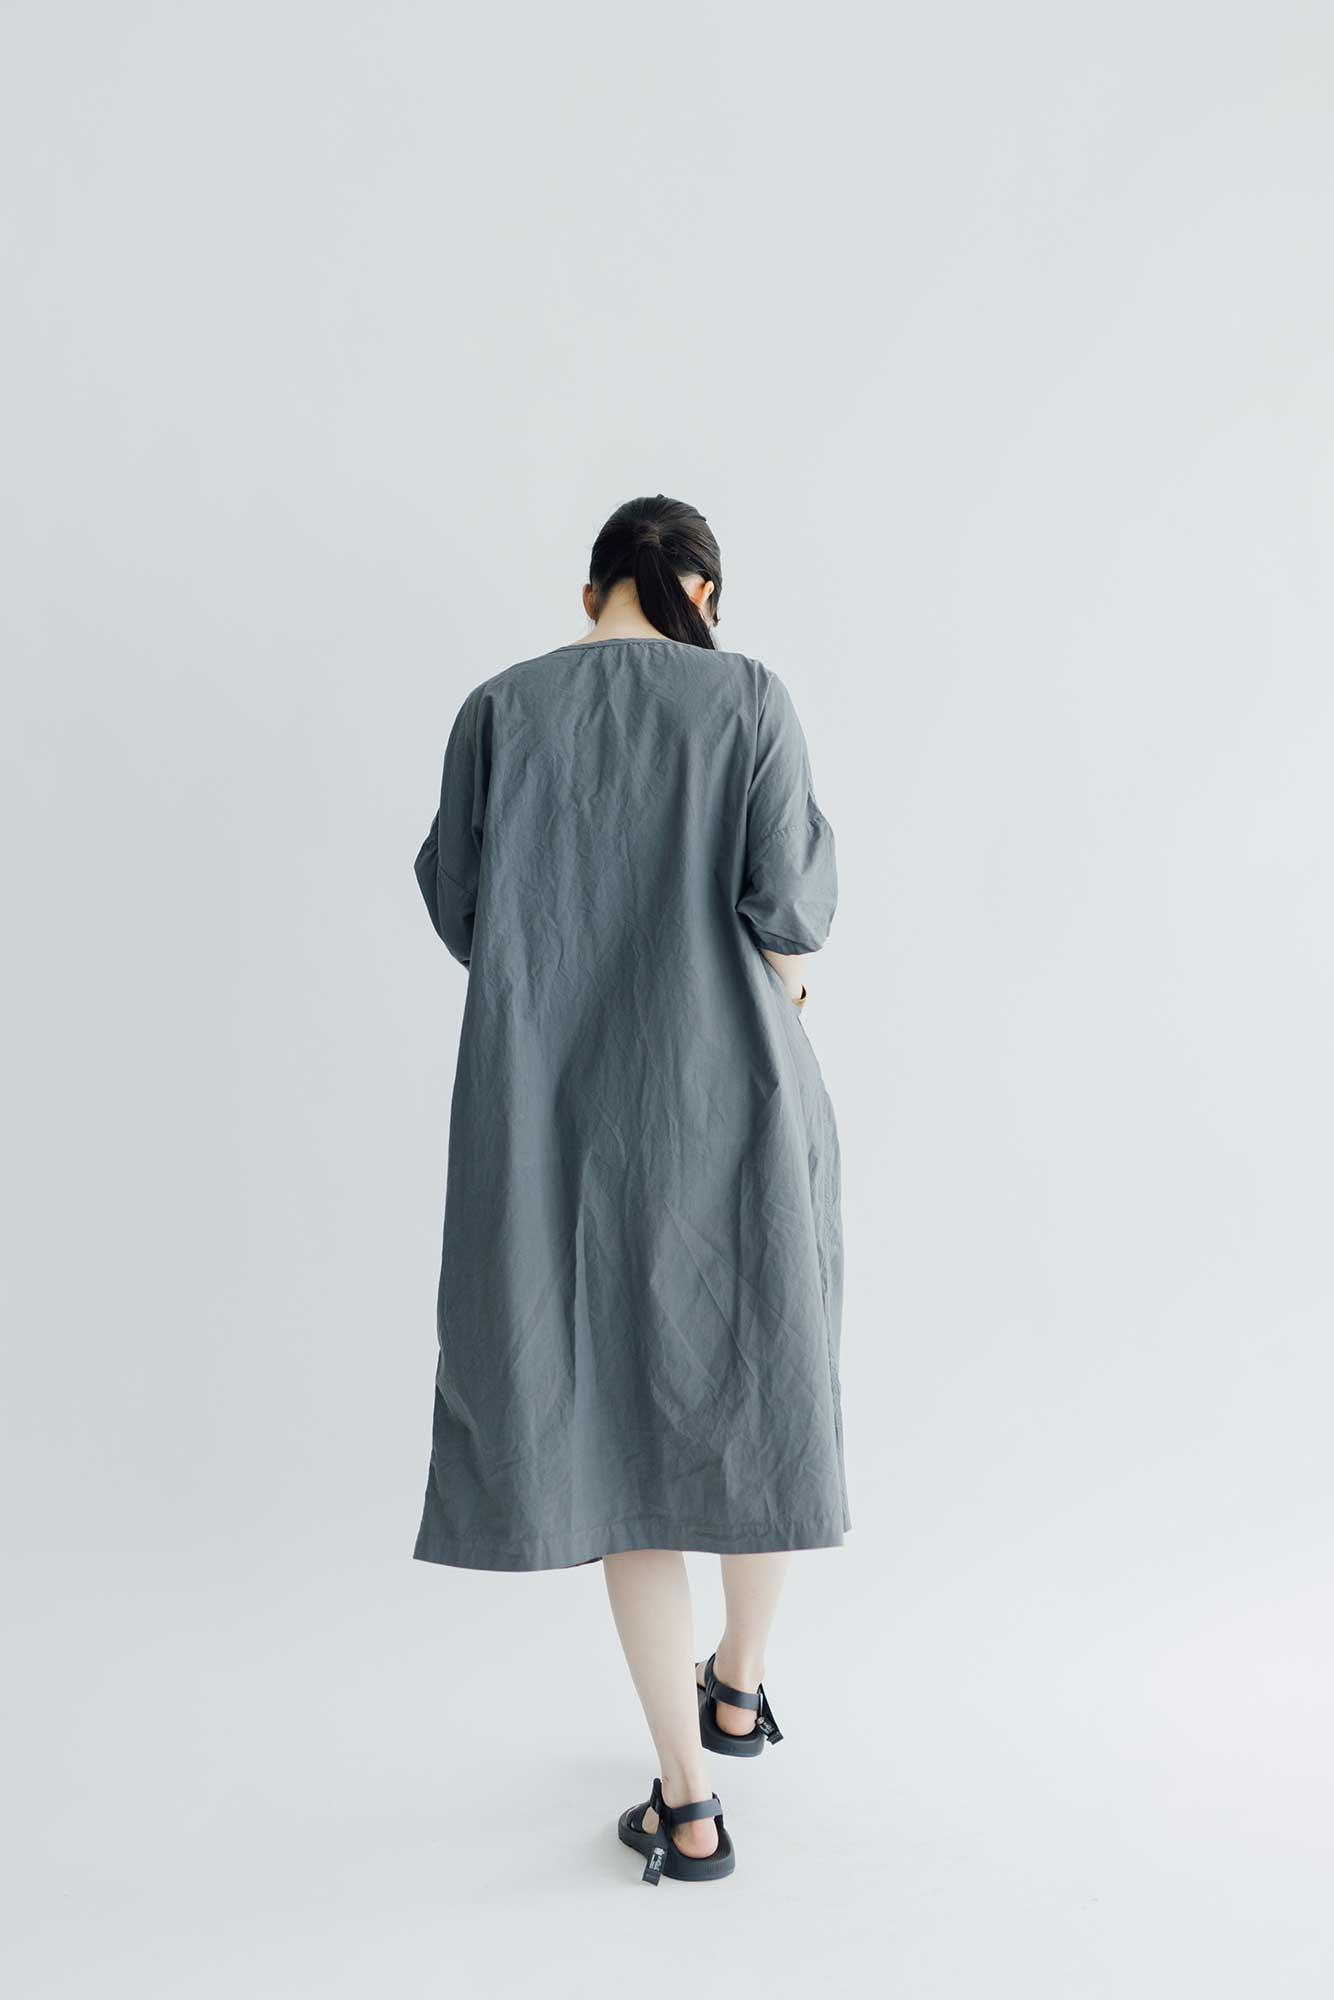 miiThaaii ヤシュパル ワンピース